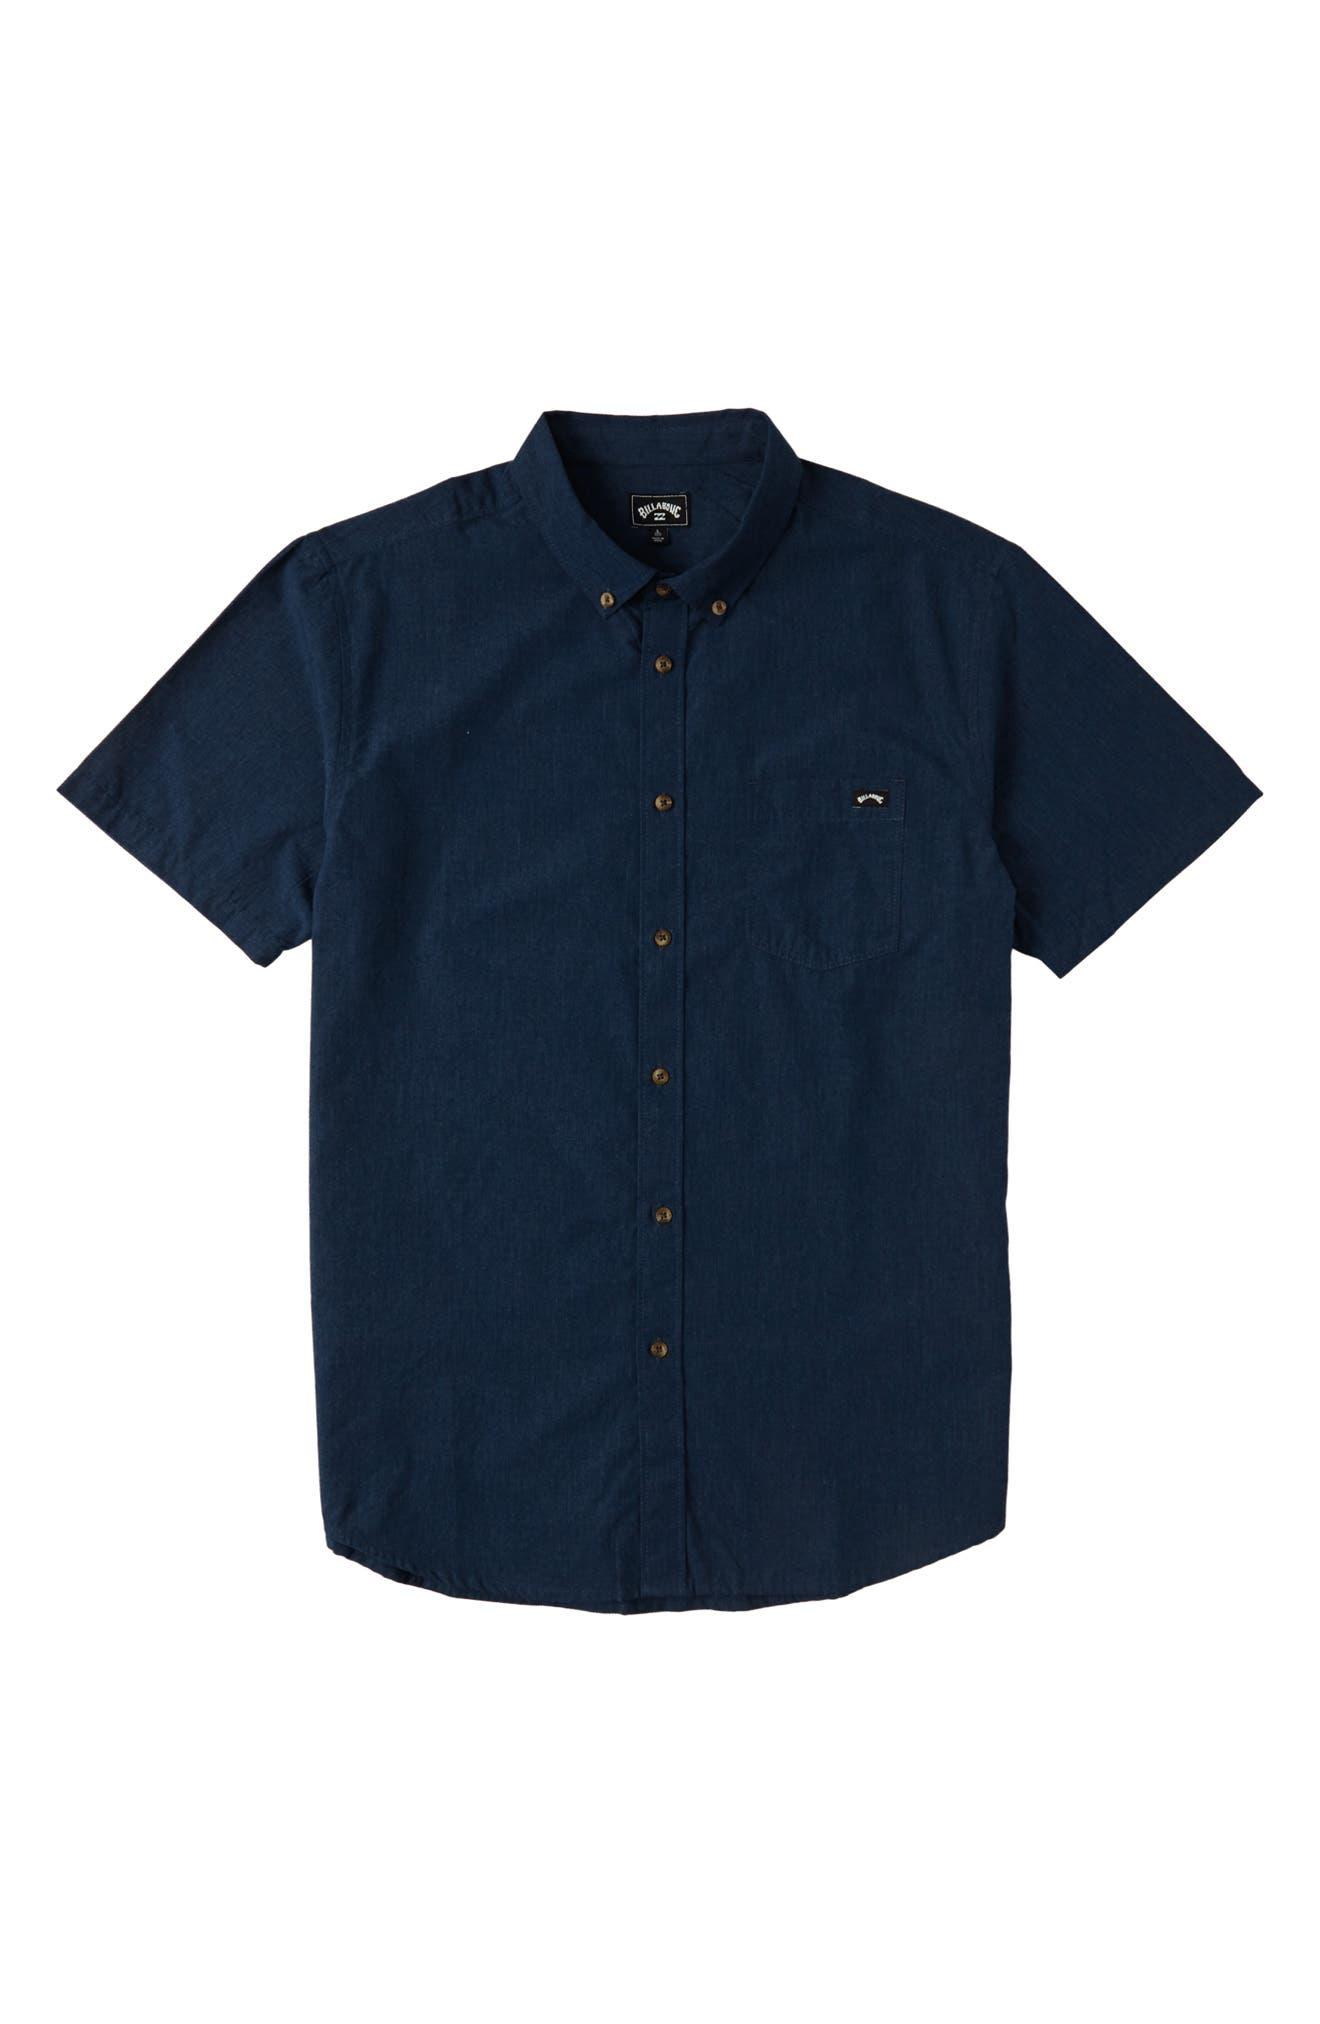 All Day Short Sleeve Button-Down Shirt